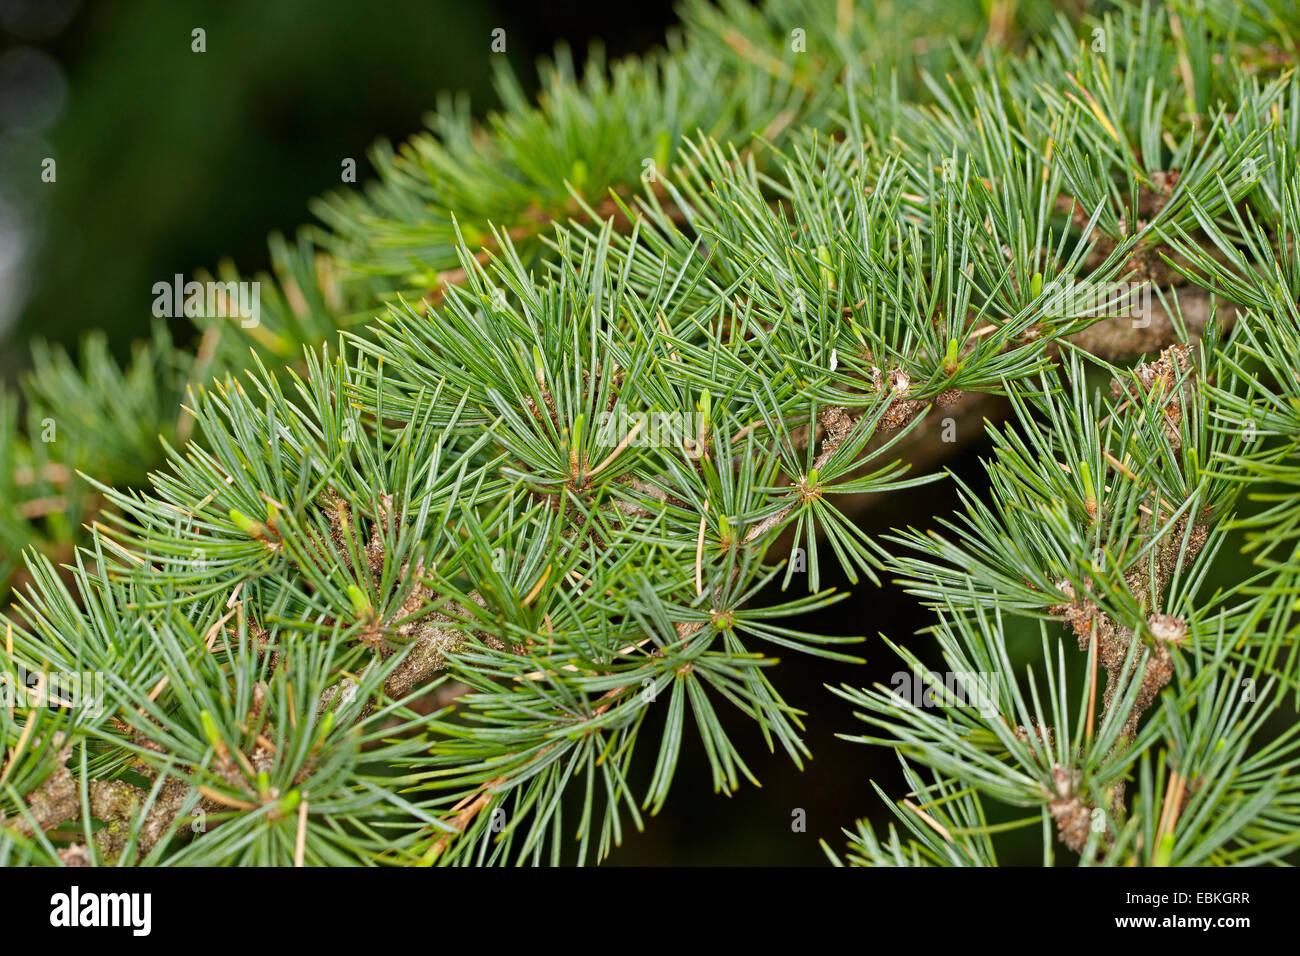 El cedro del Líbano, el cedro del Líbano (Cedrus libani, Cedrus libanotica), rama Imagen De Stock